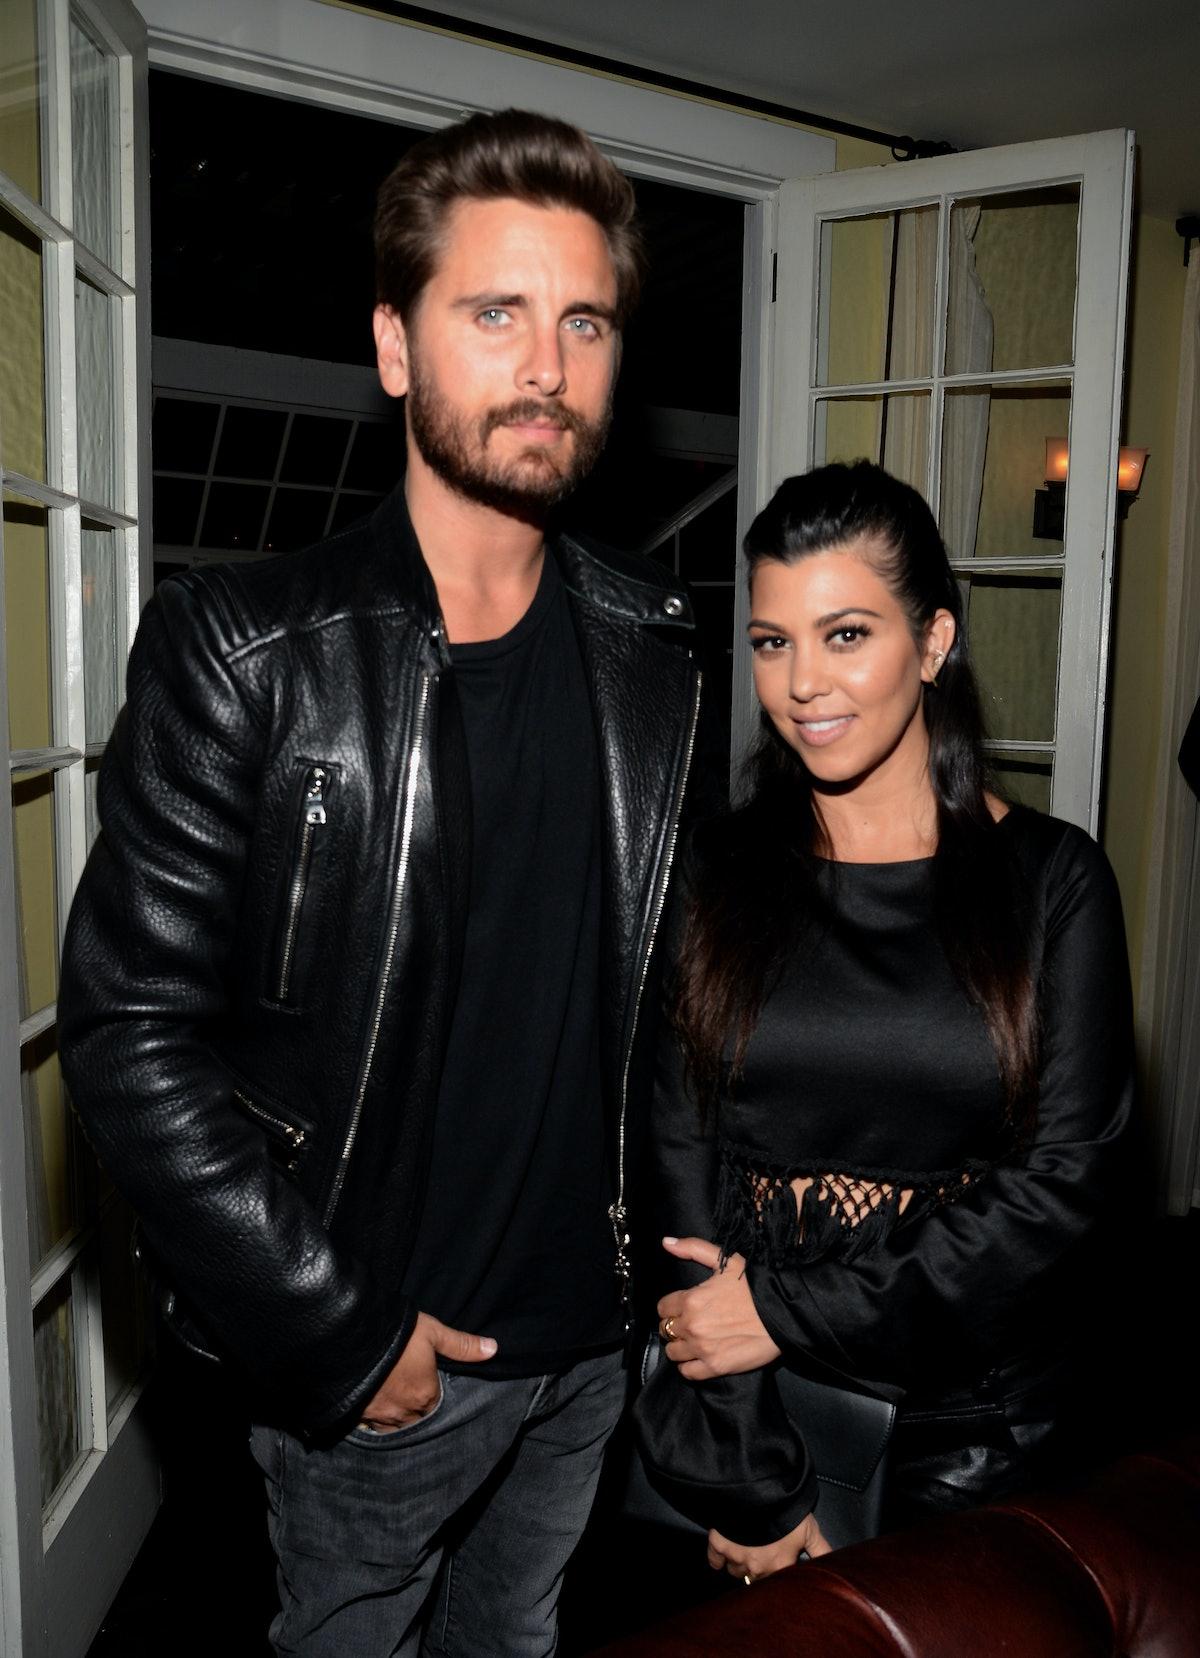 Kourtney Kardashian's Conversation About Scott Disick & Soulmates Is So Intense